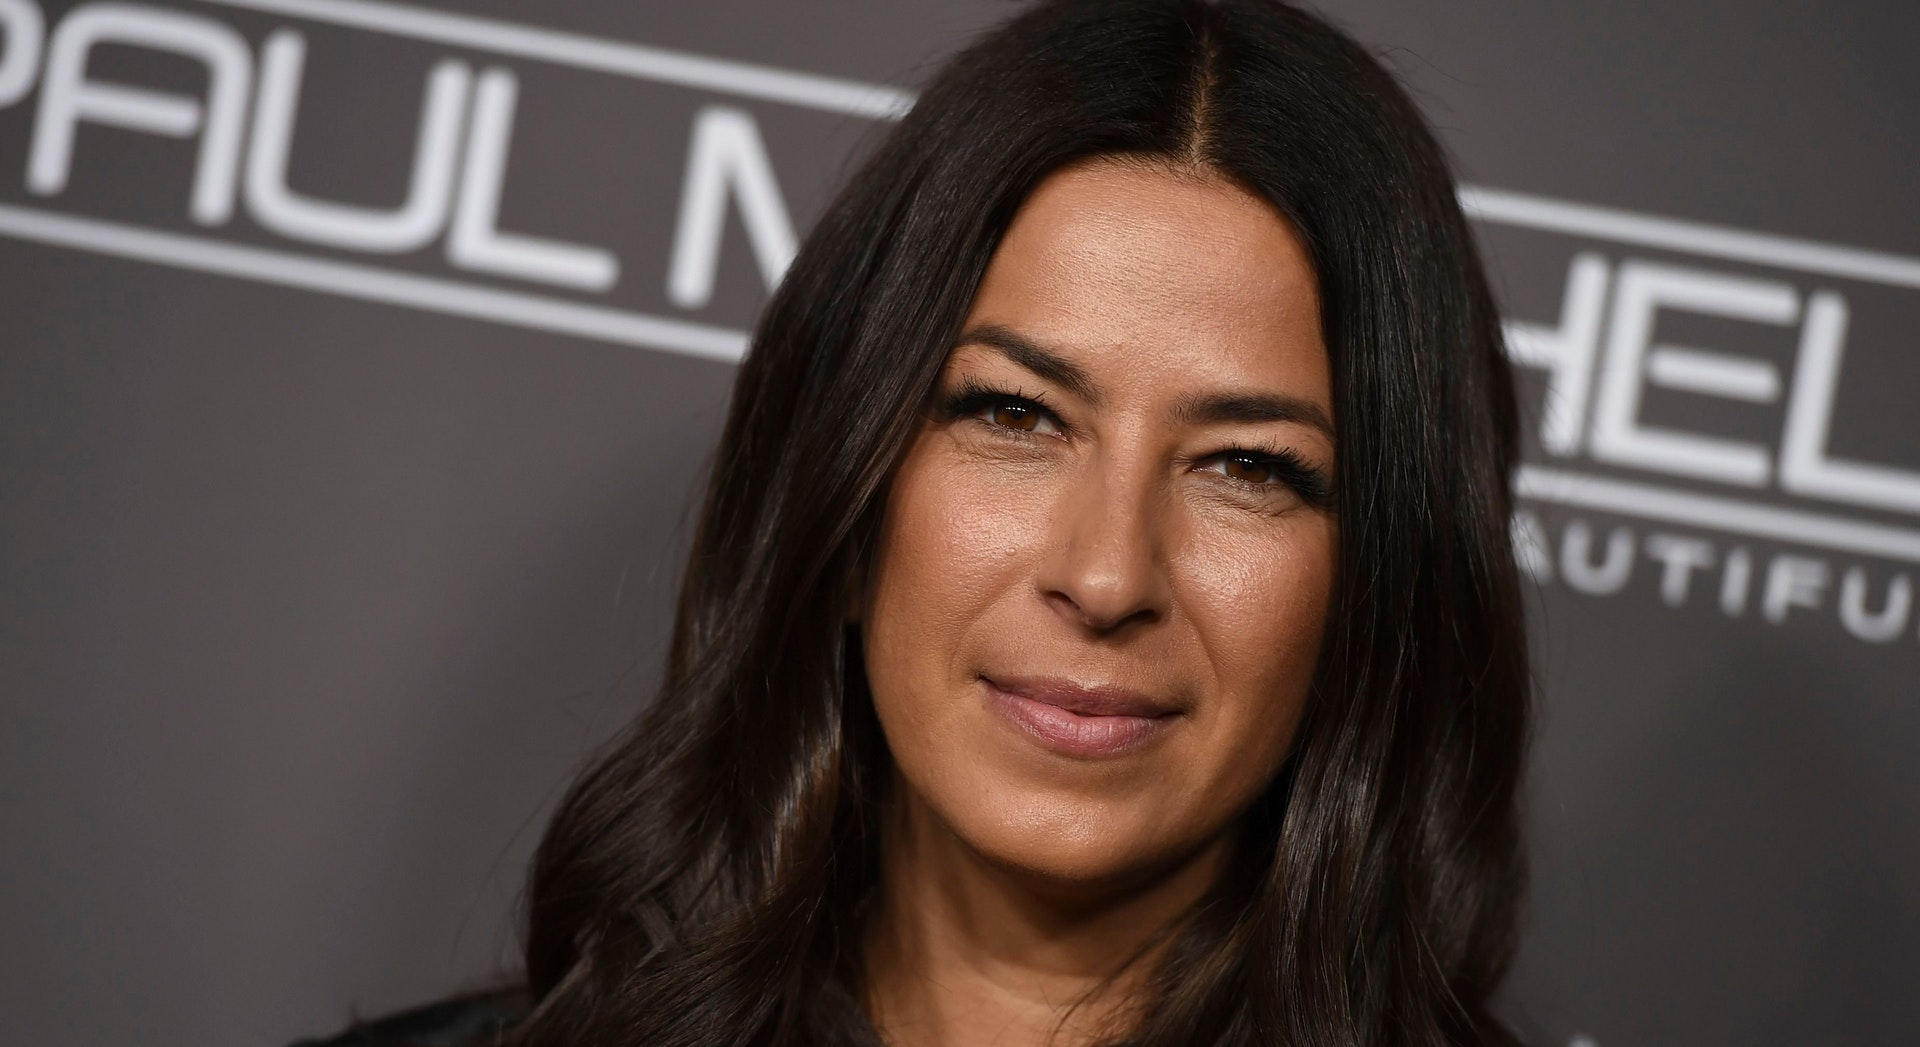 NYFW: Rebecca Minkoff brings a fresh take to the working woman's wardrobe